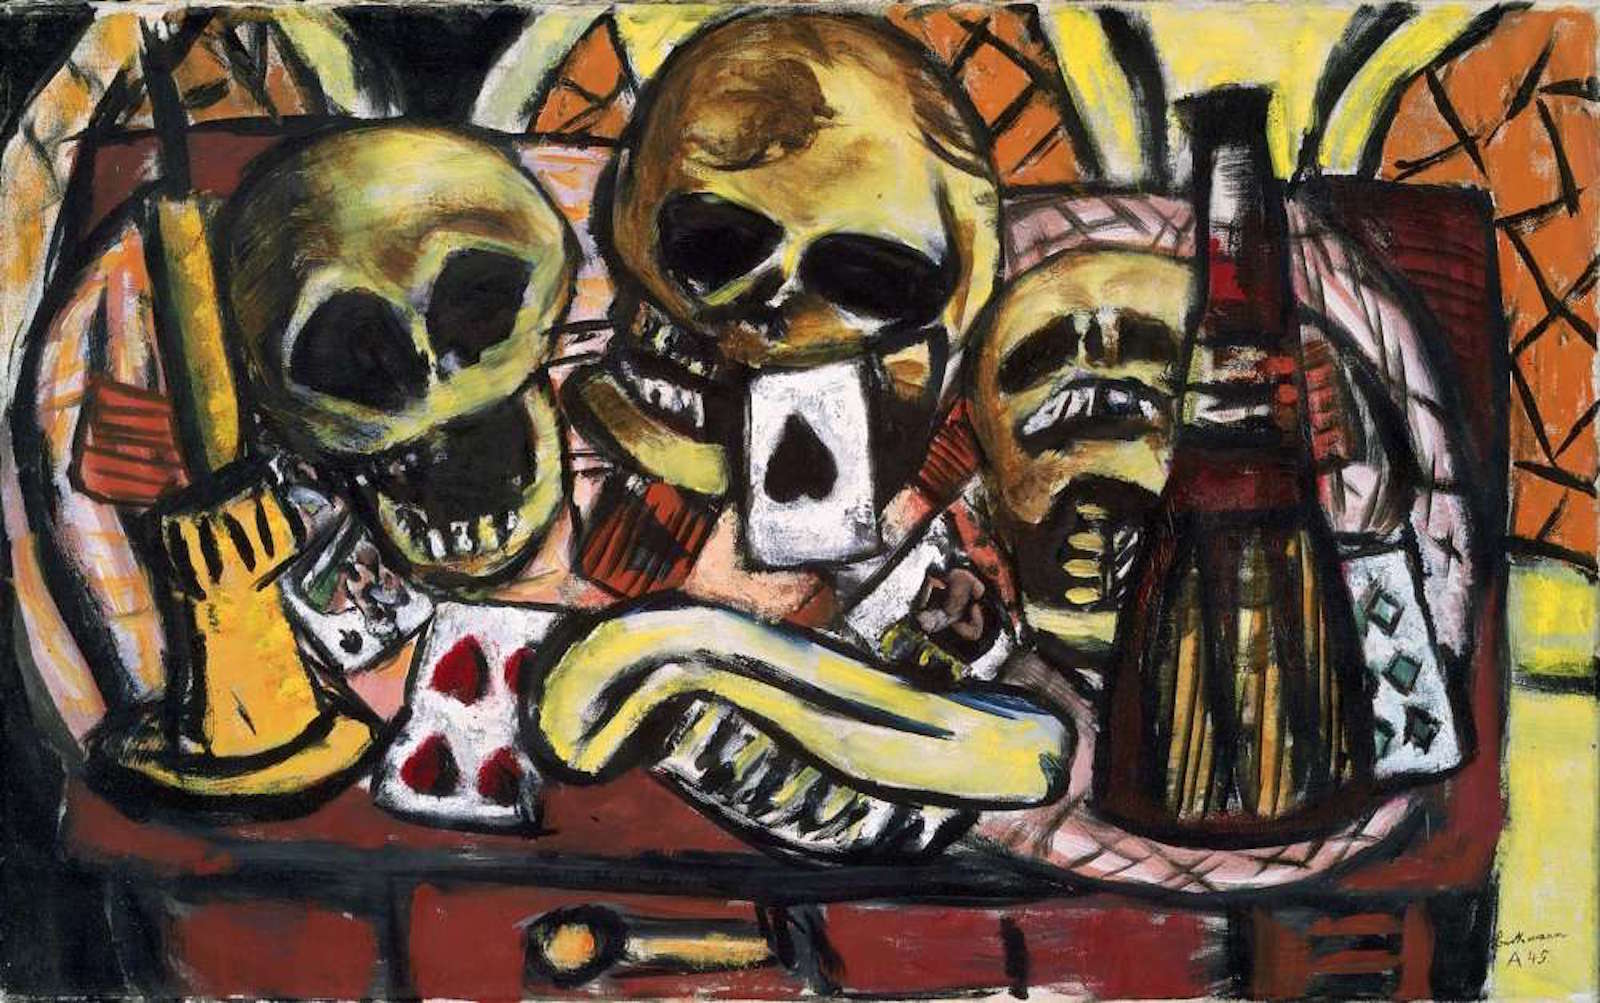 Max Beckmann, Still Life with Three Skulls (1945)